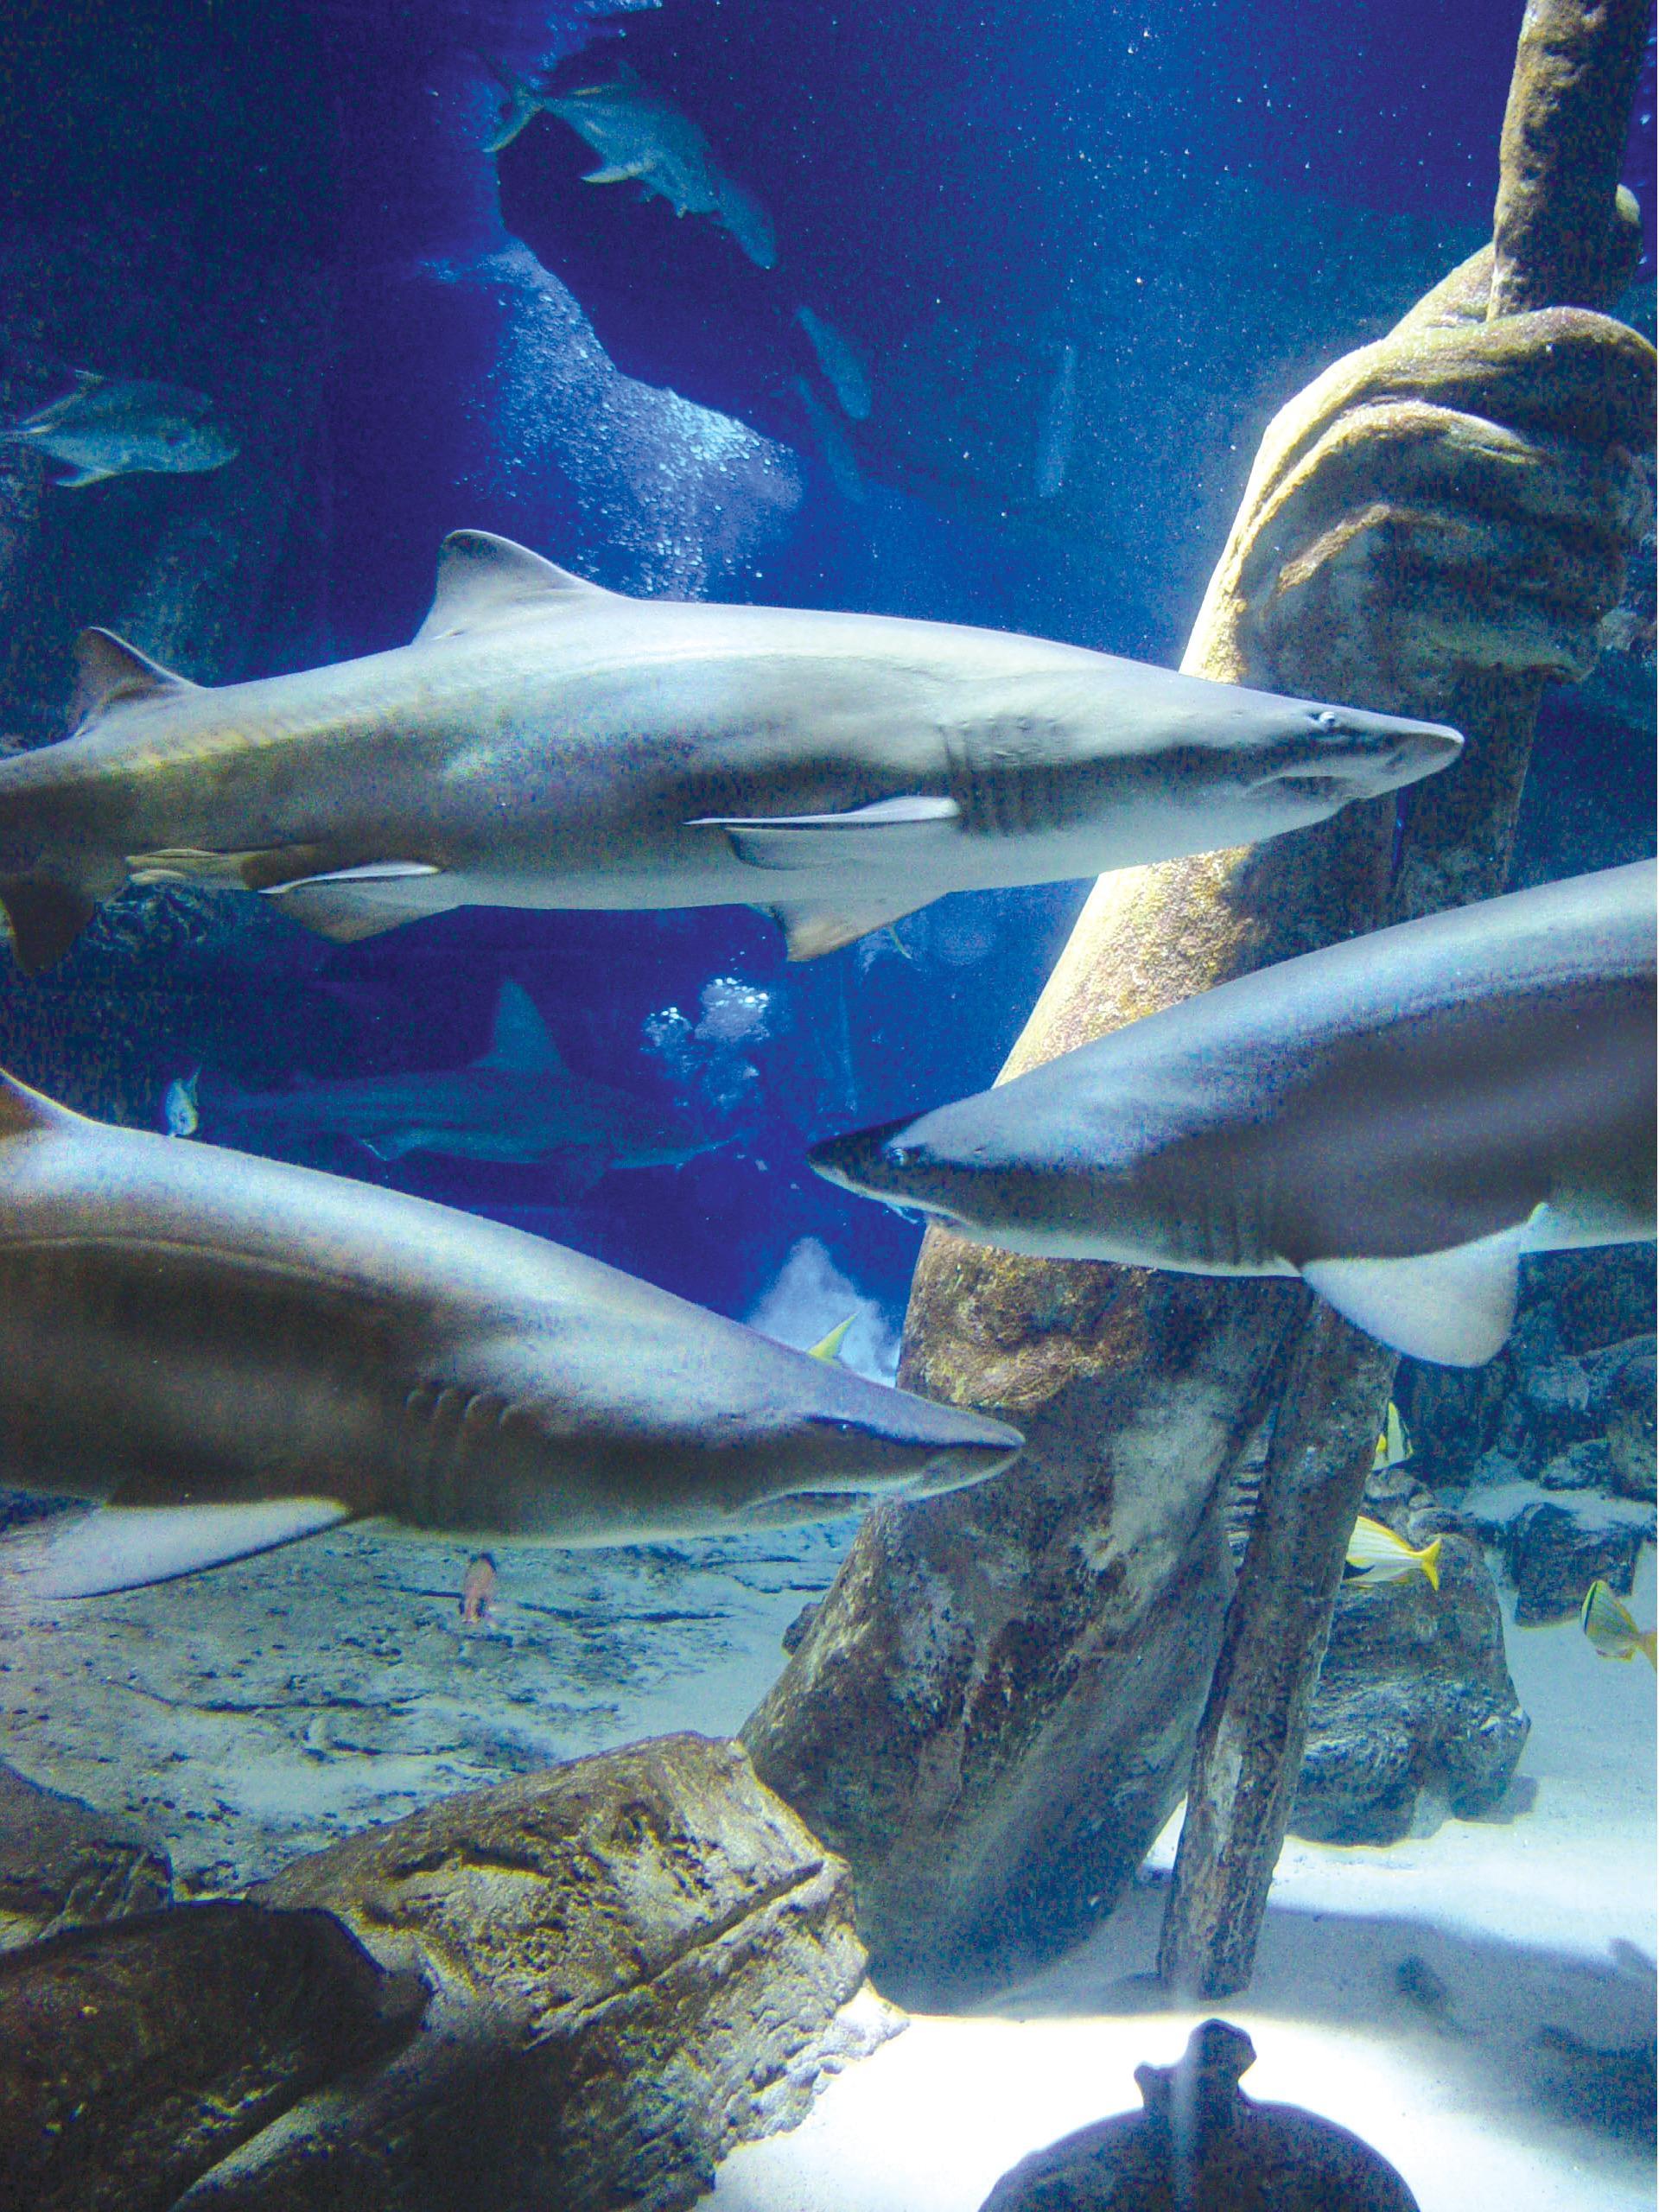 Discount coupons for atlantis aquarium riverhead ny